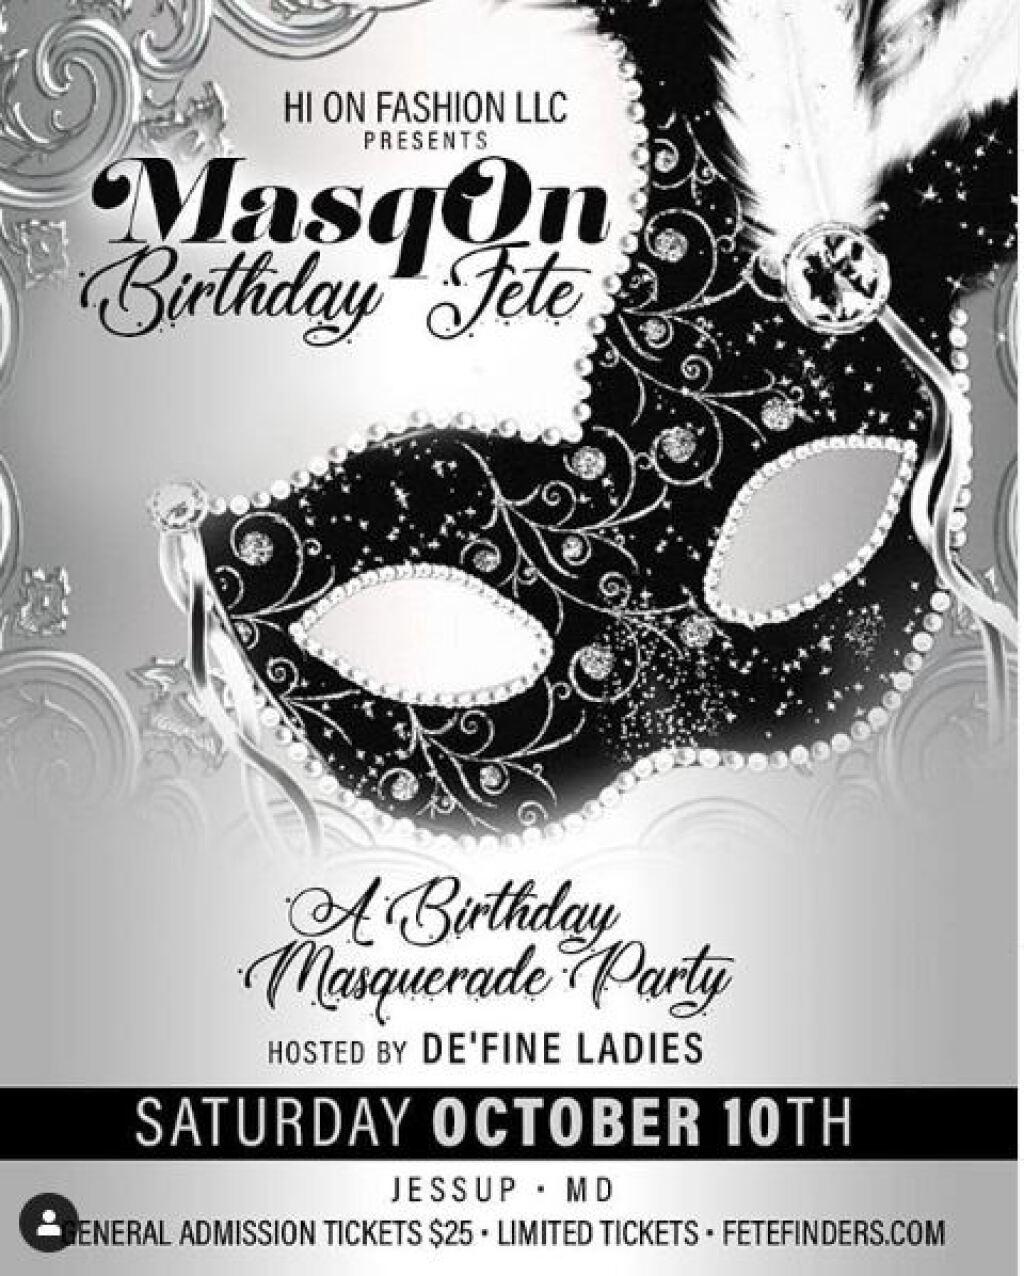 Masq On Birthday Fete flyer or graphic.